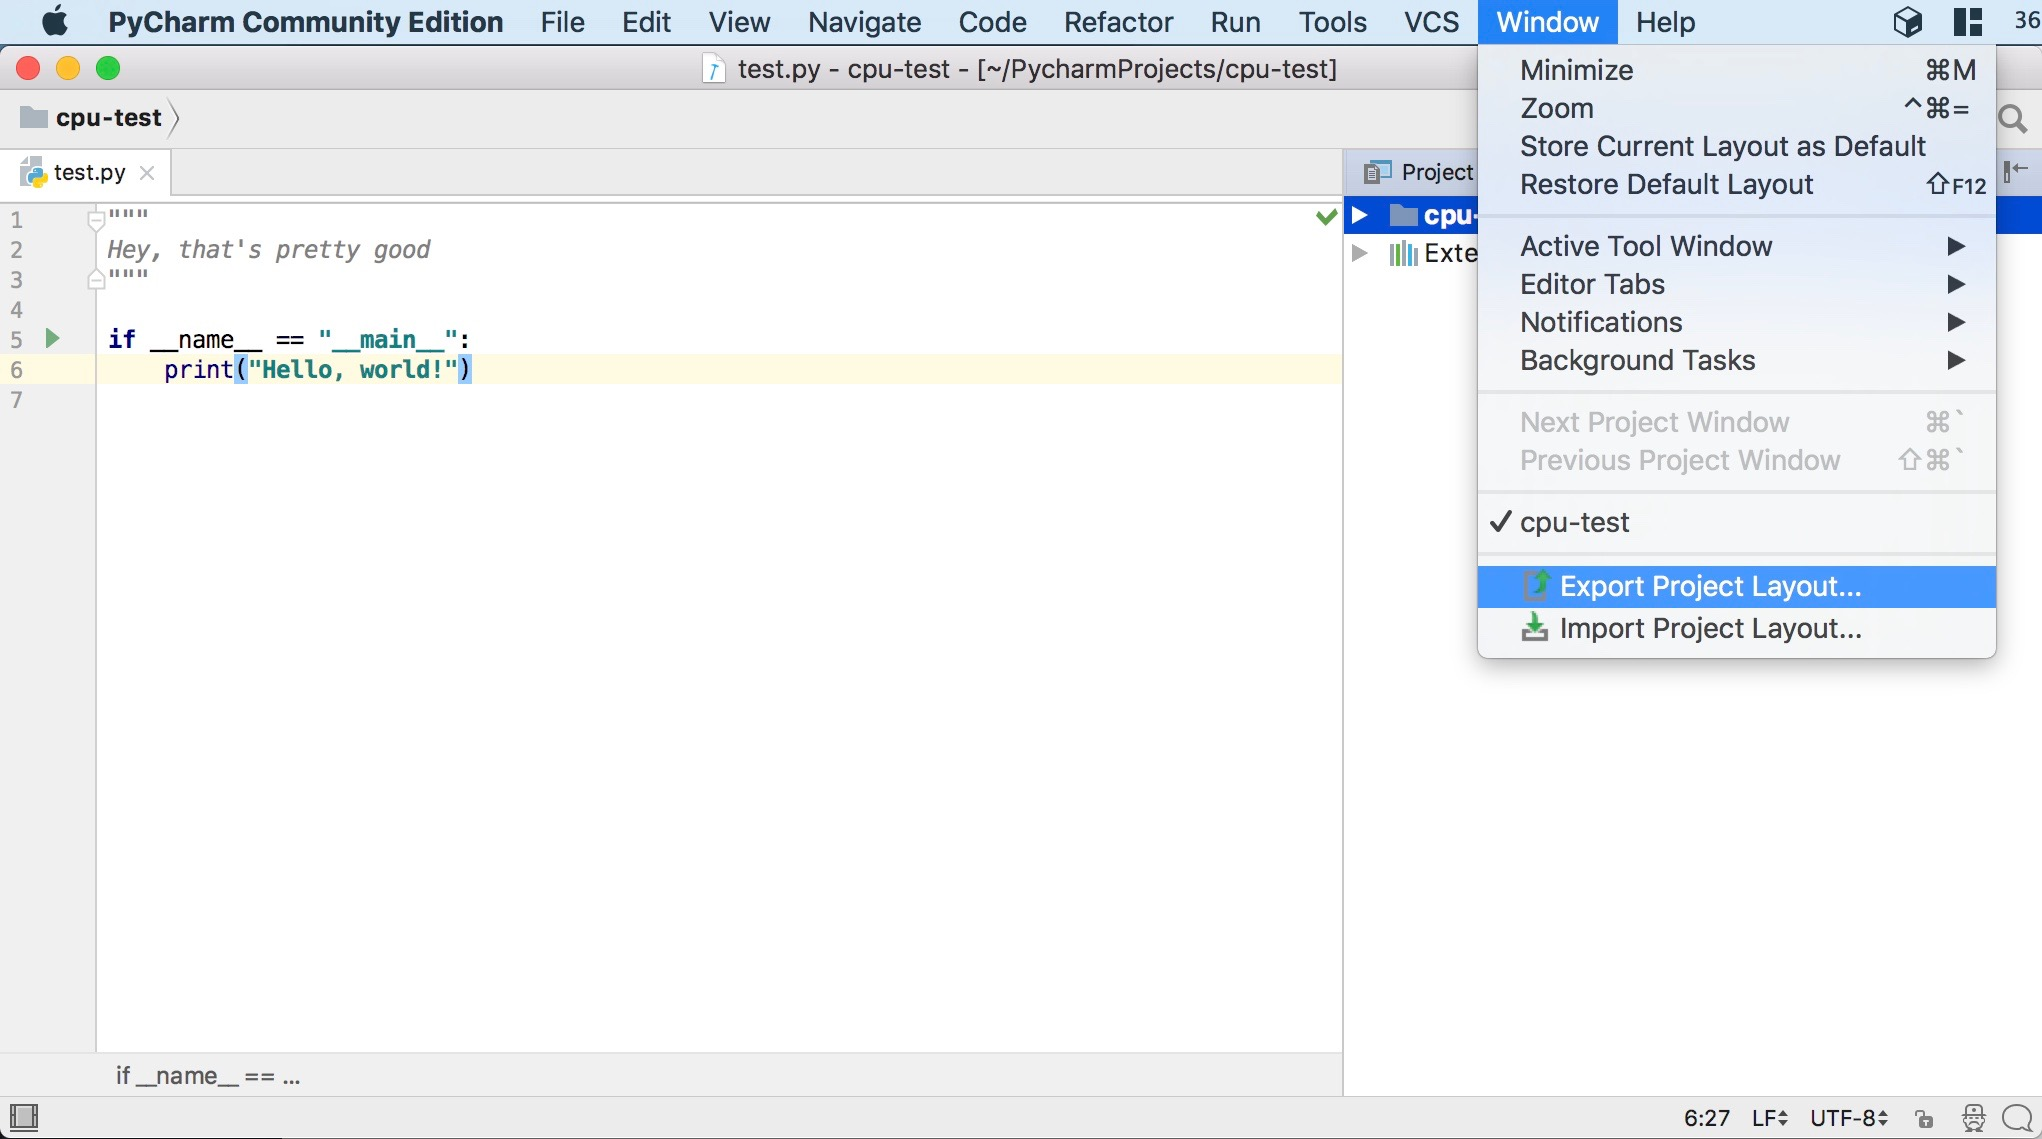 IntelliJ IDEA plugin to manage window layouts